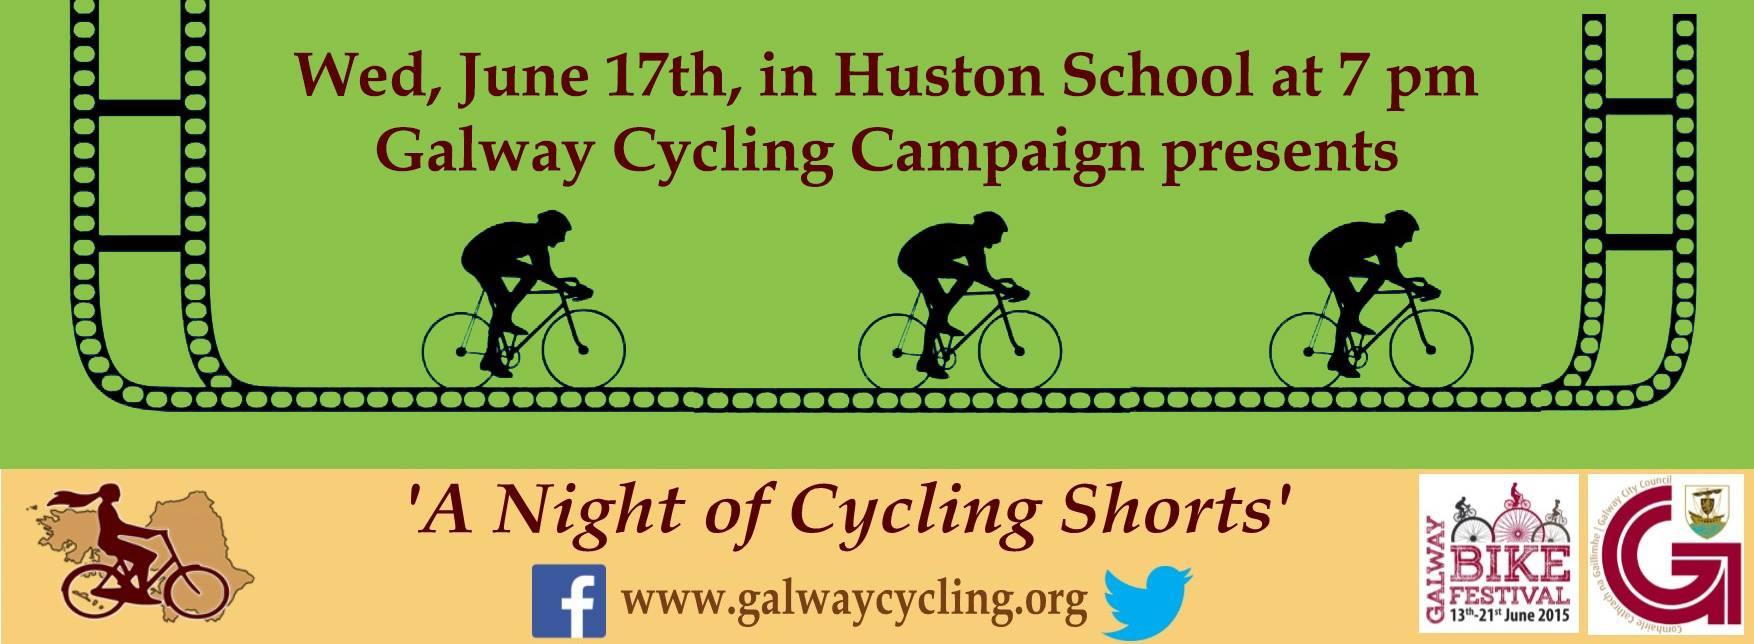 bike week banner 2015